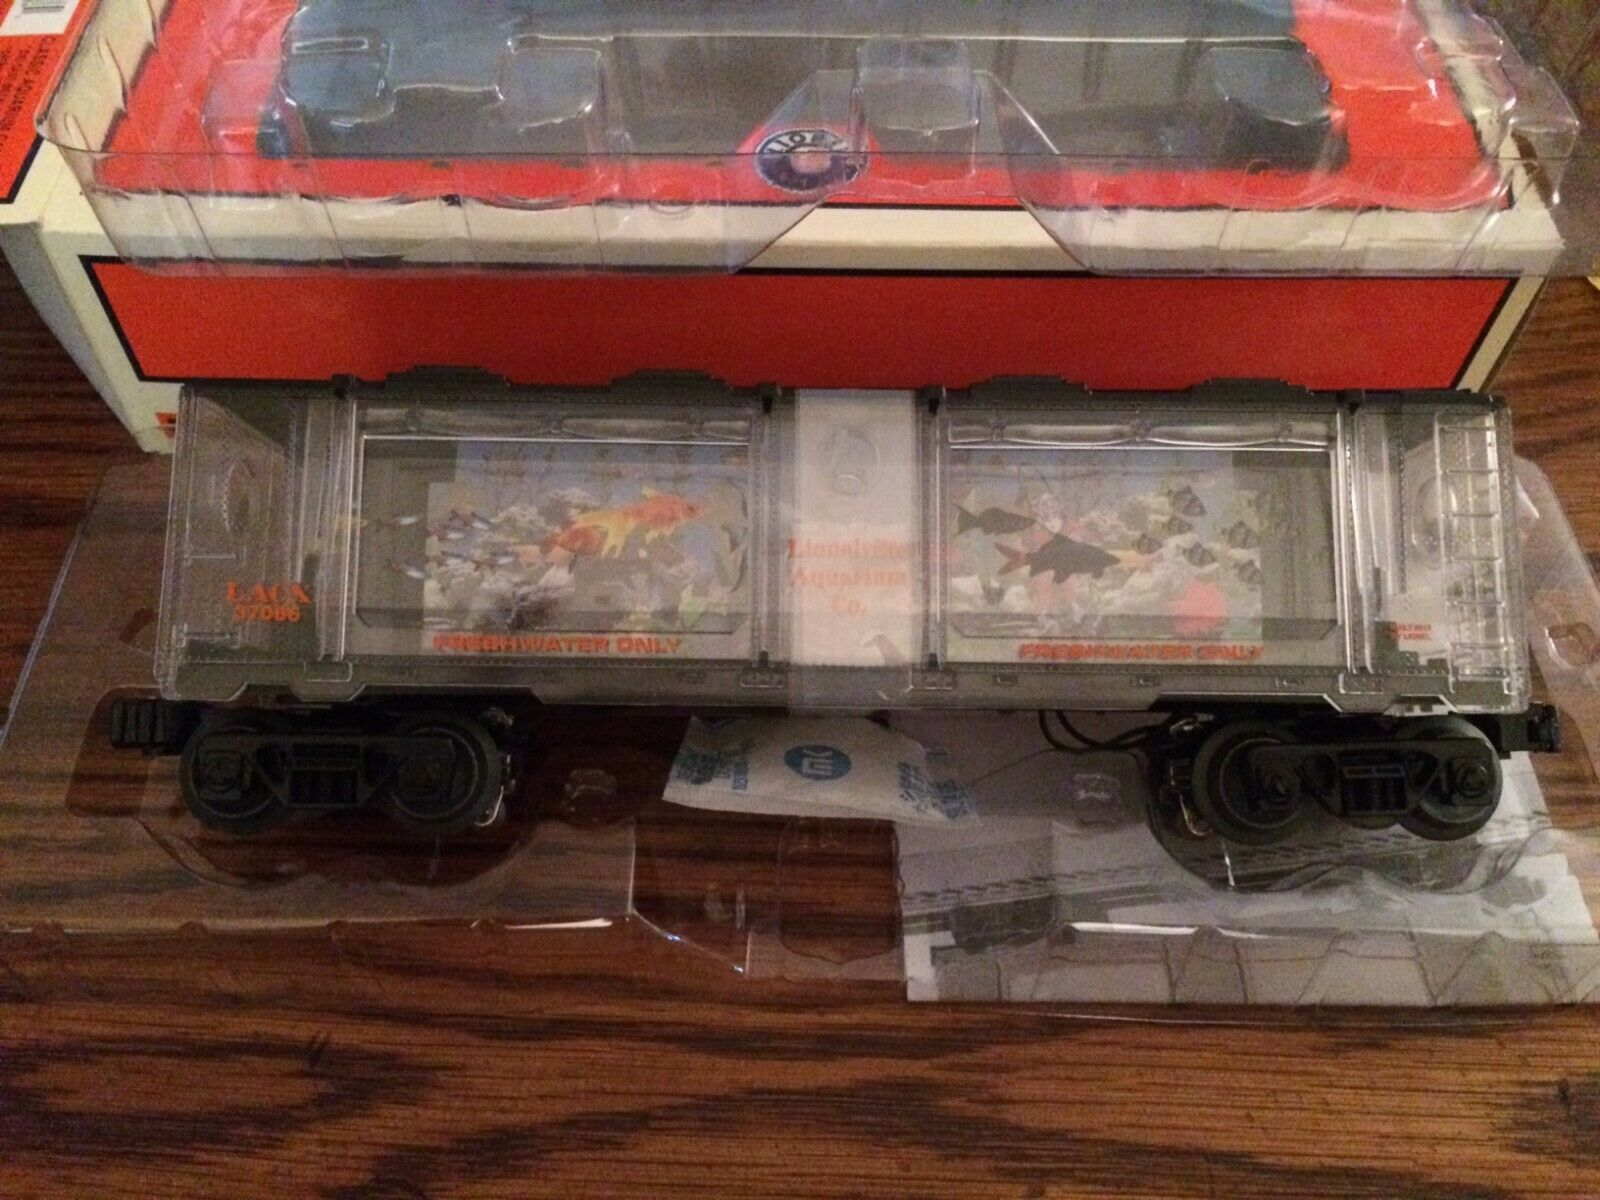 Lionel 37086 Classic Clear (Transparent) Body Operating Aquarium Car New in Box1